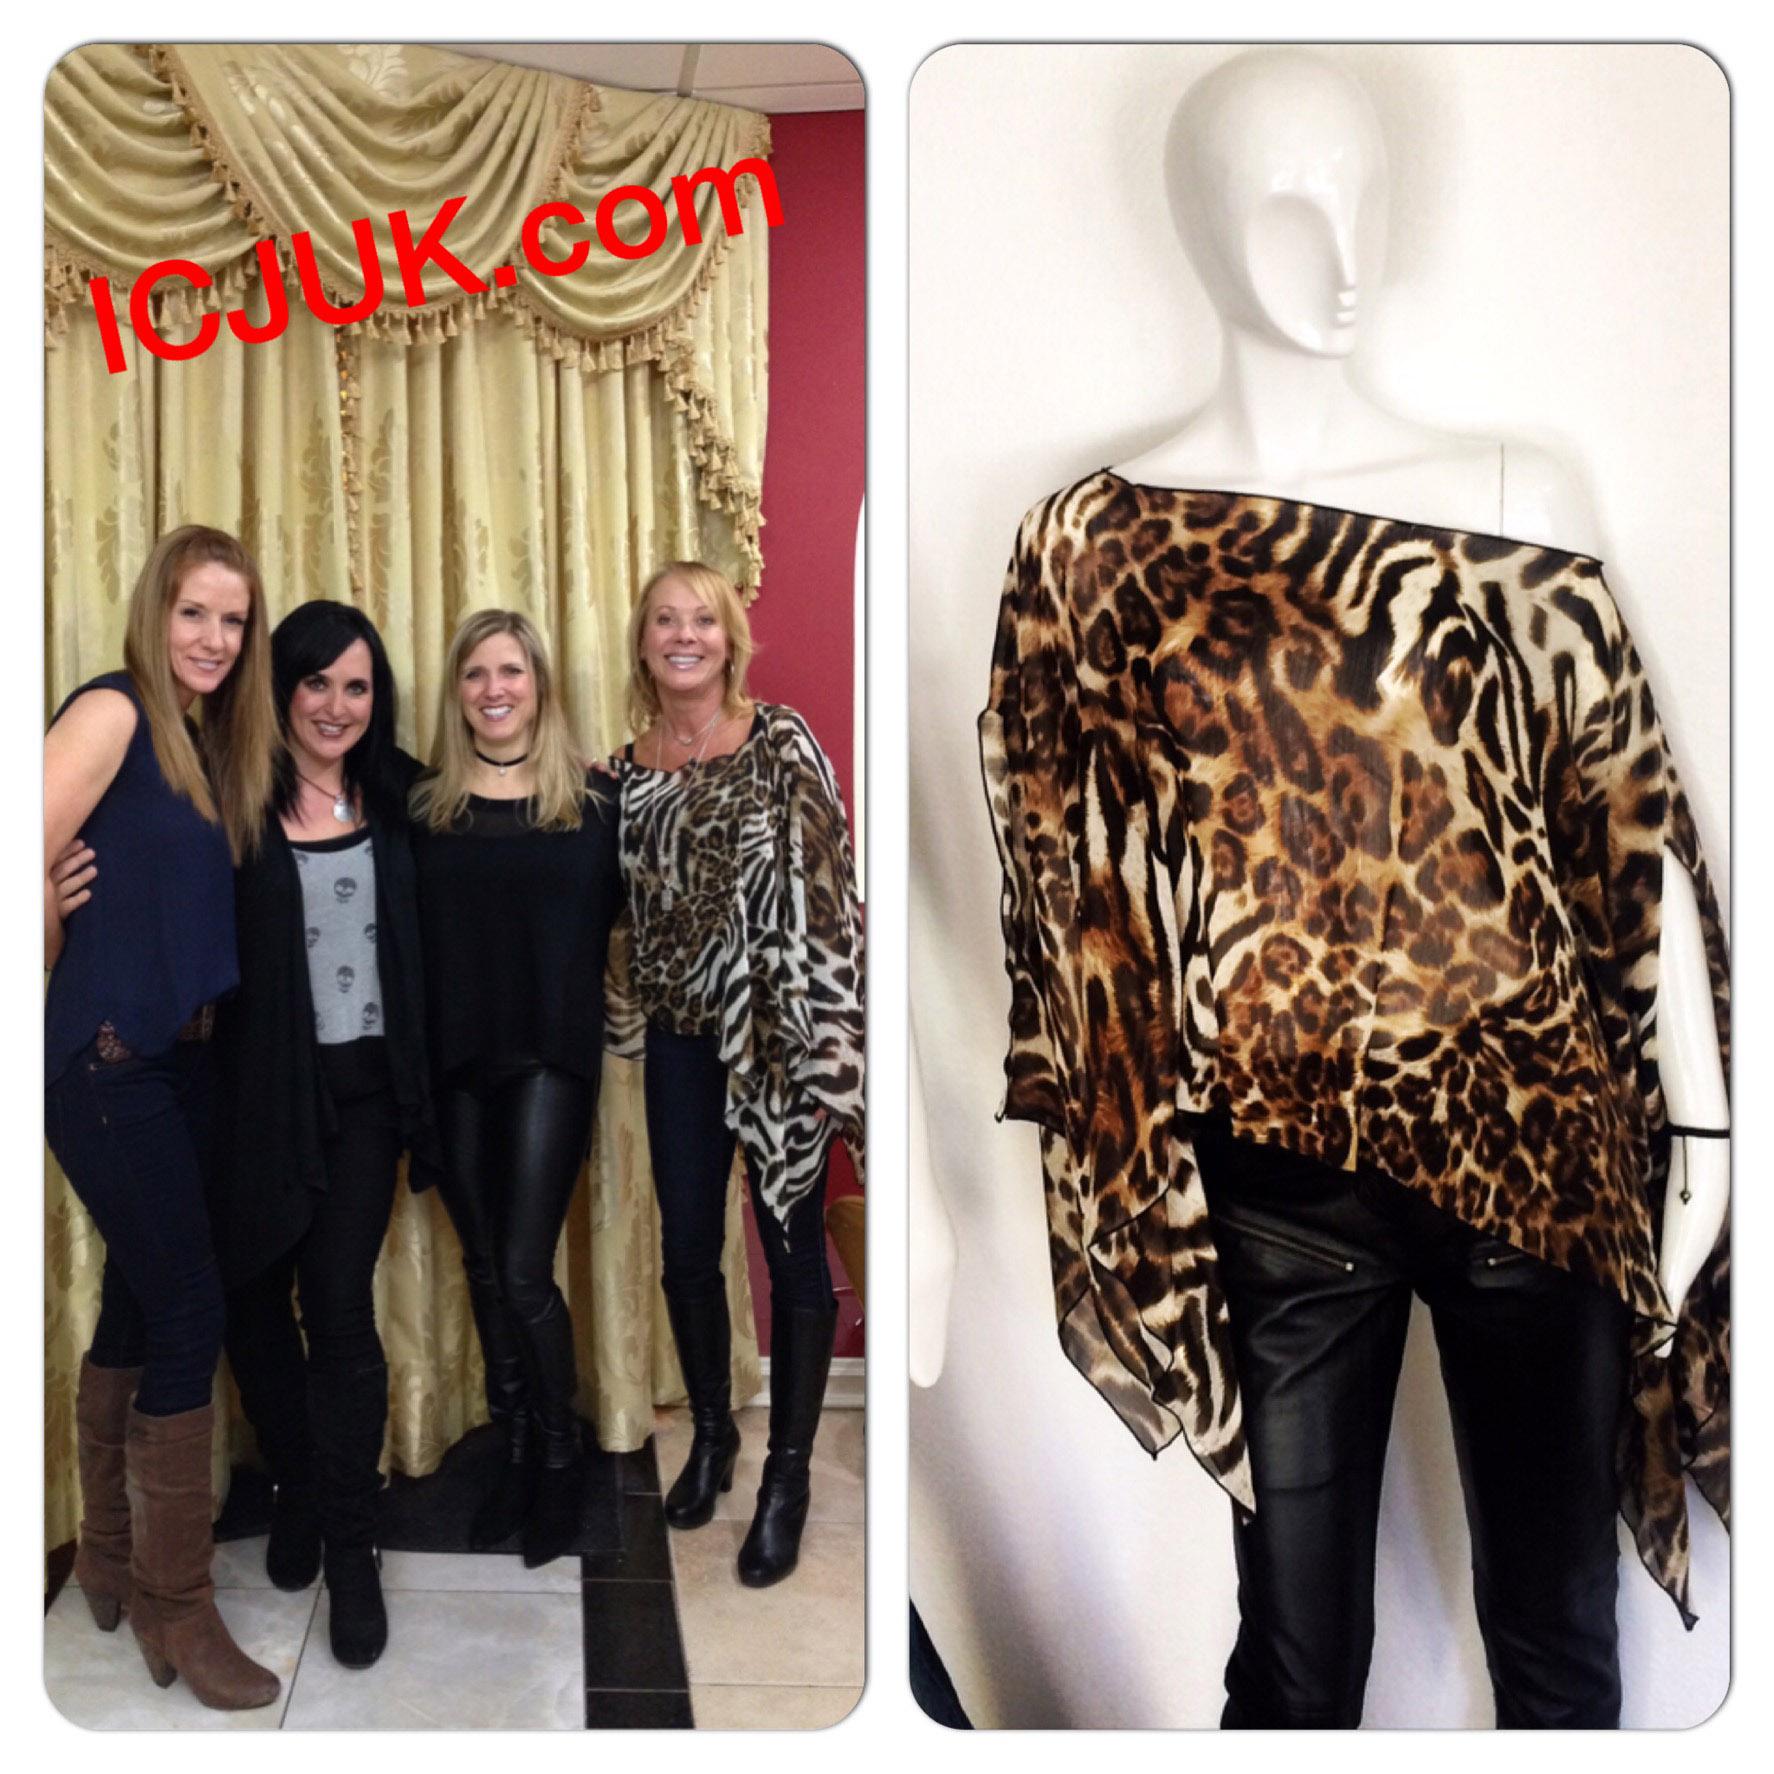 Rock ICJUK Leopard Print Top